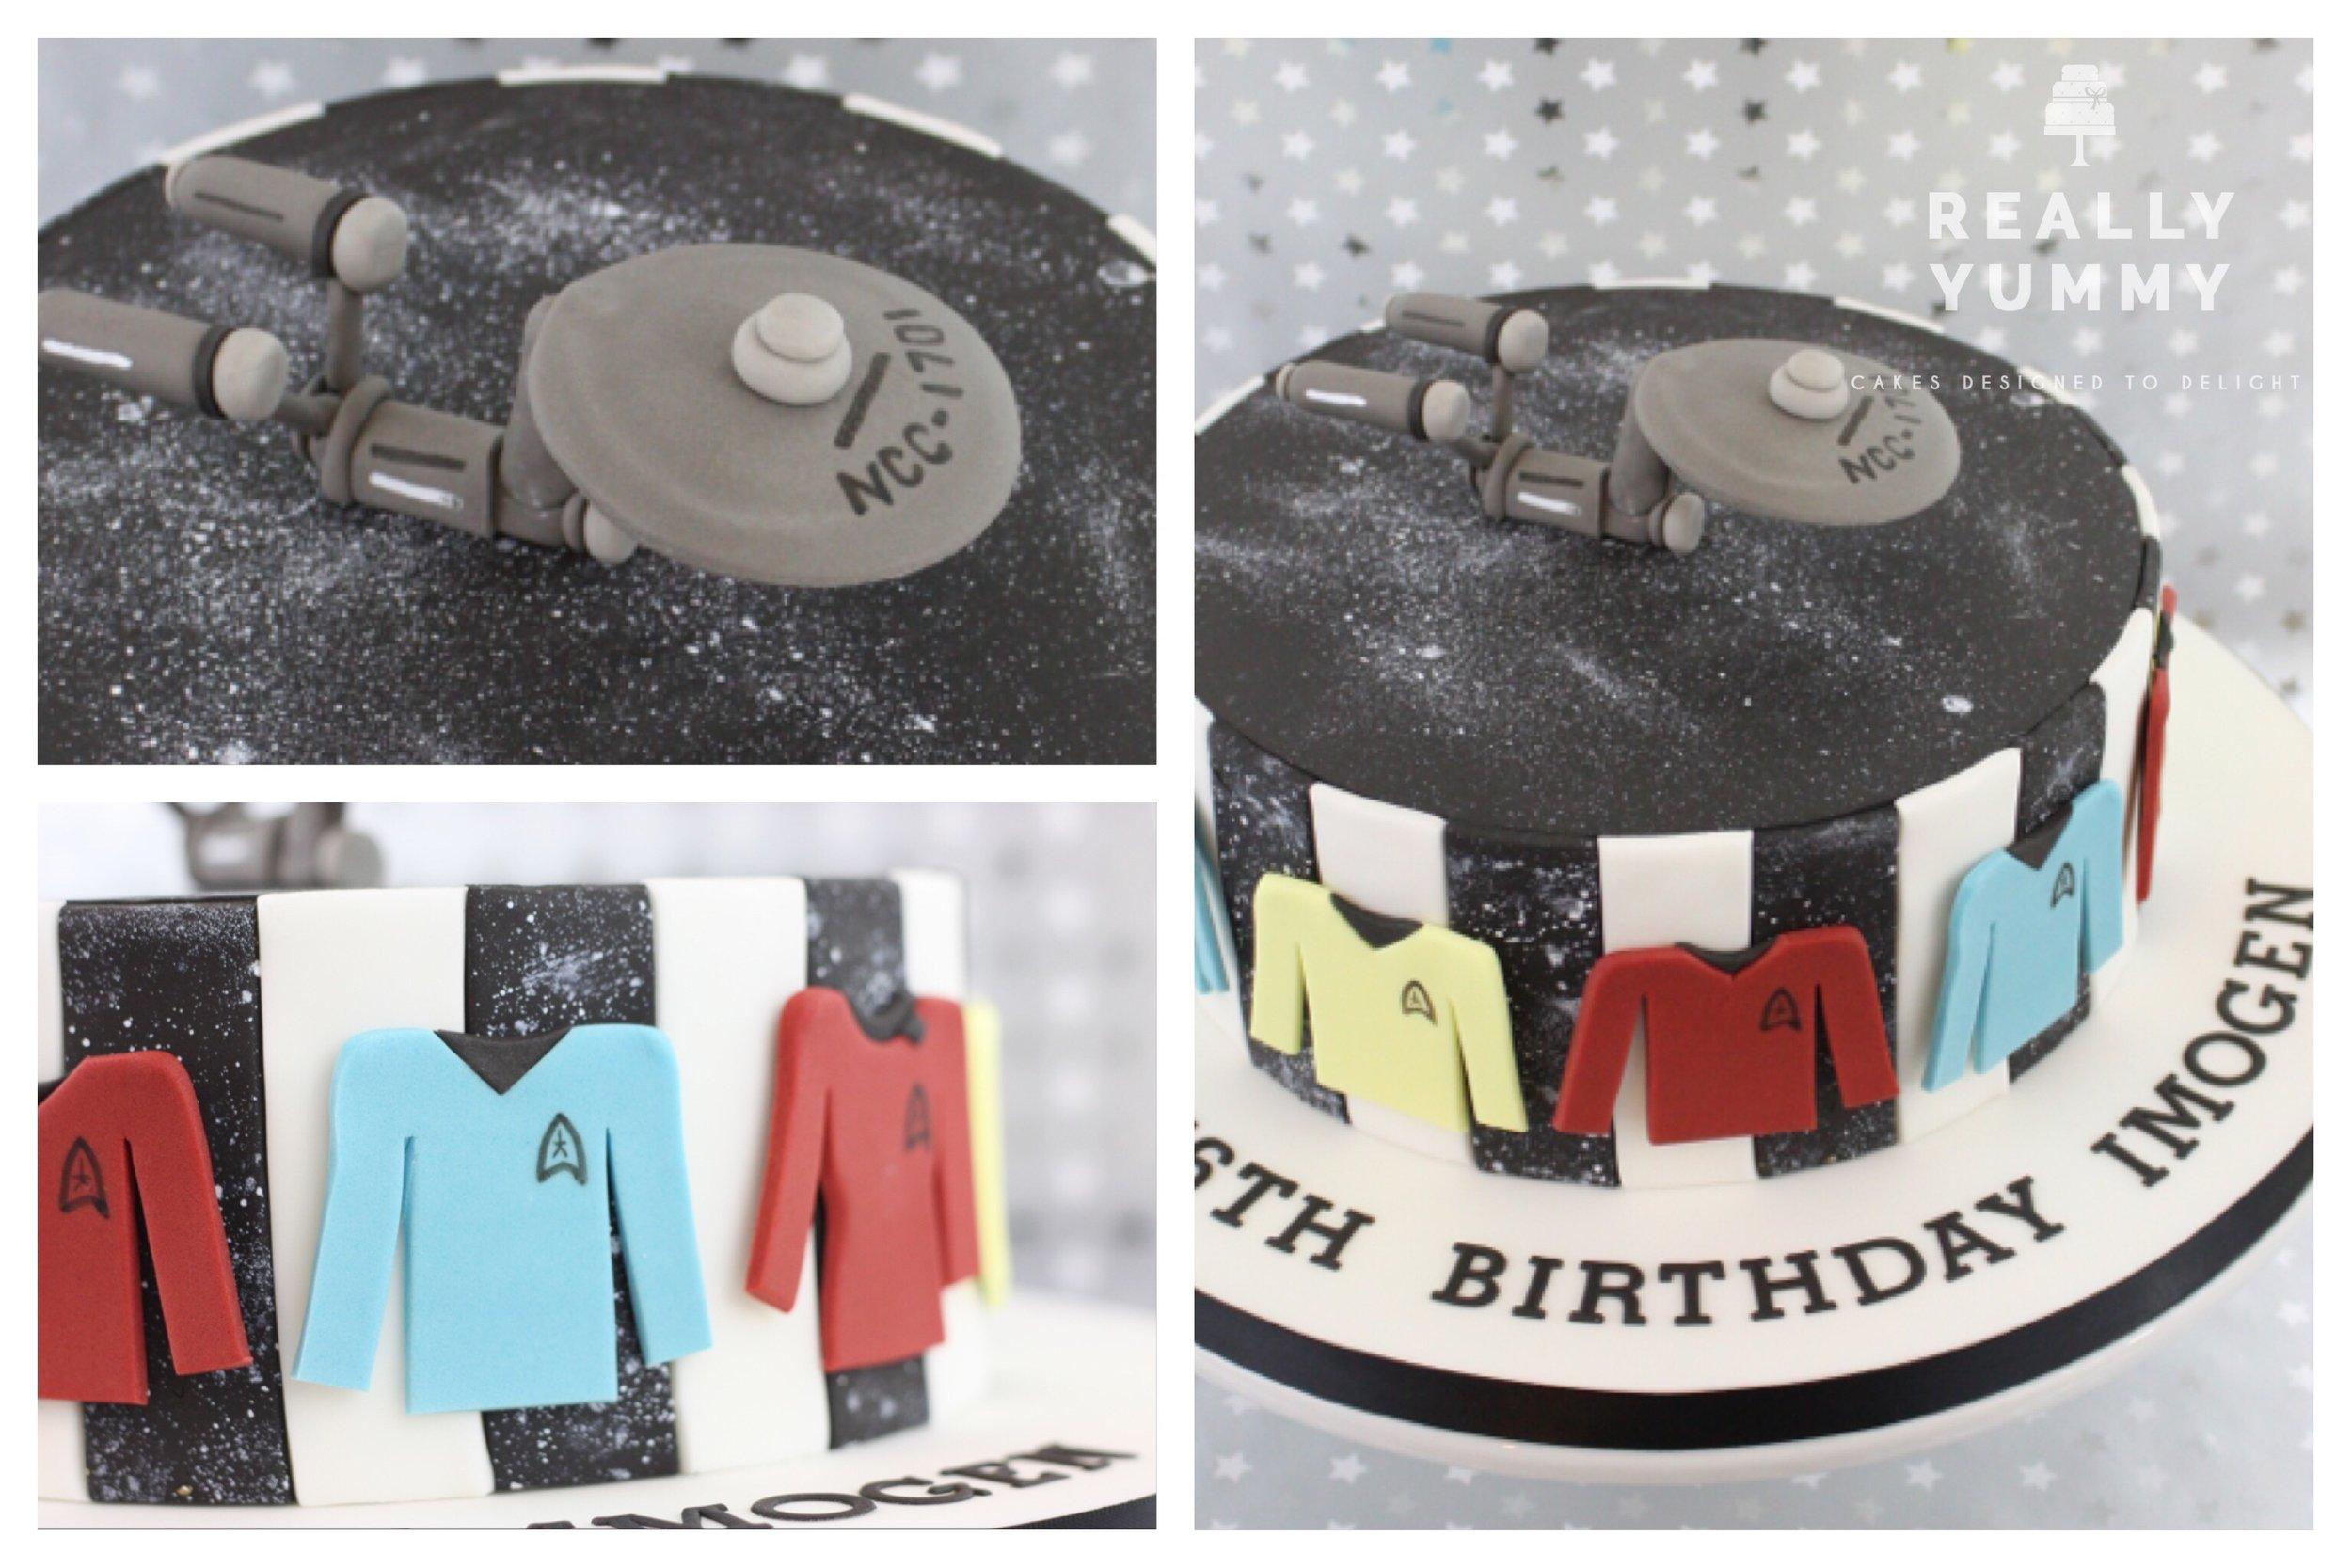 Retro Star Trek cake